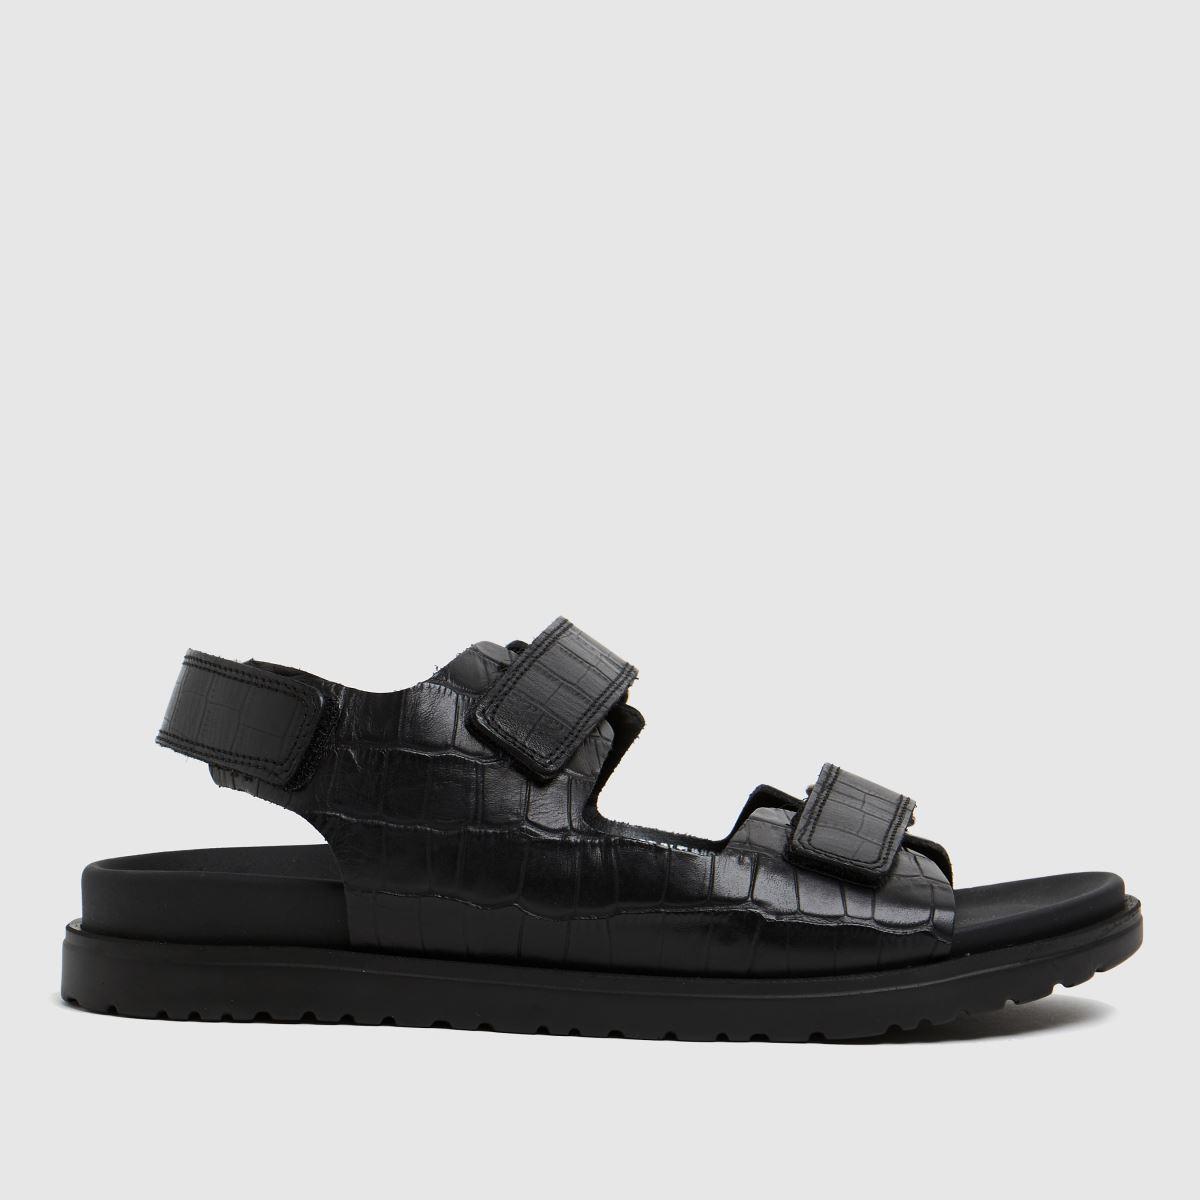 The Edit By Schuh Black Precious Croc Leathe Sandals